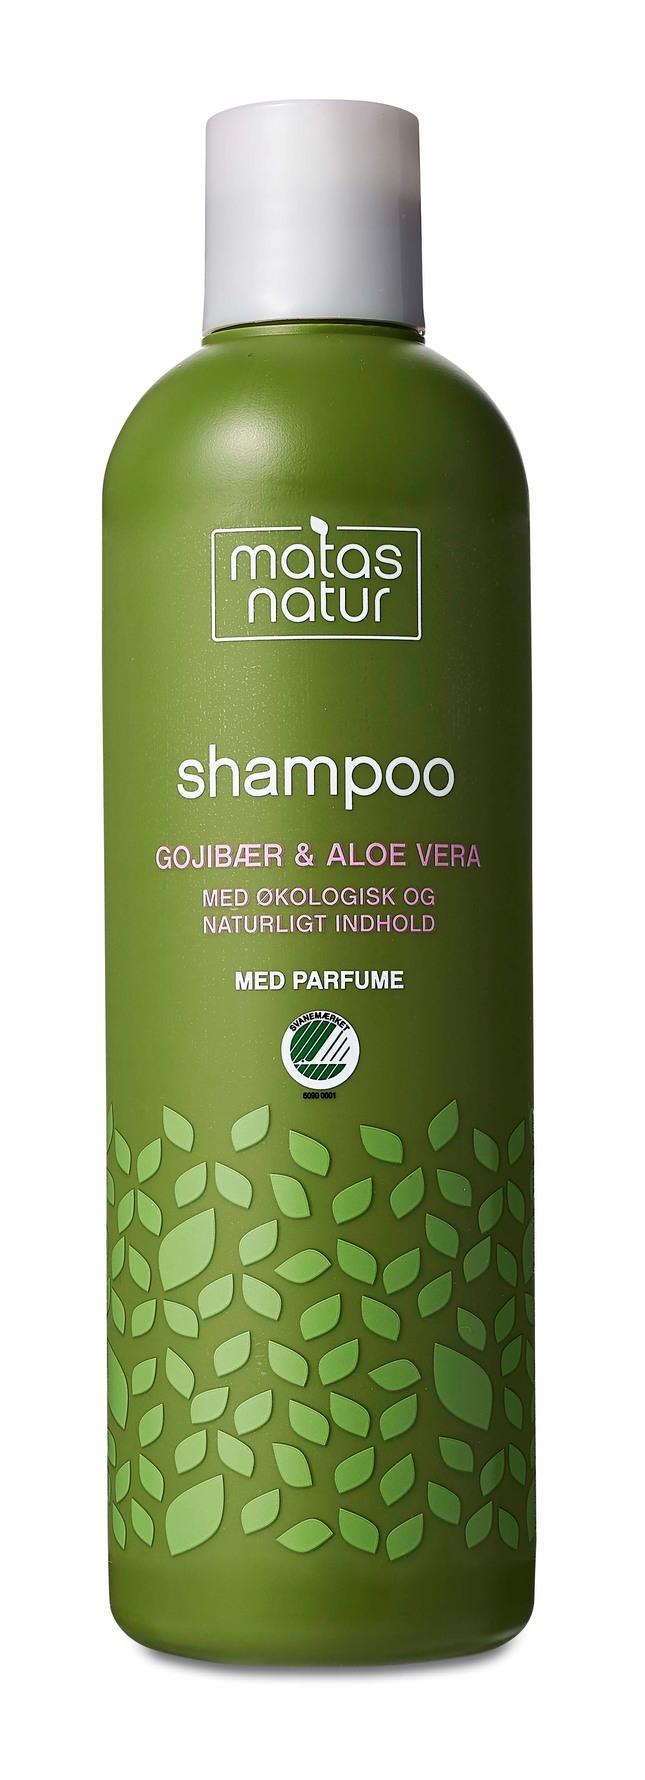 matas shampoo